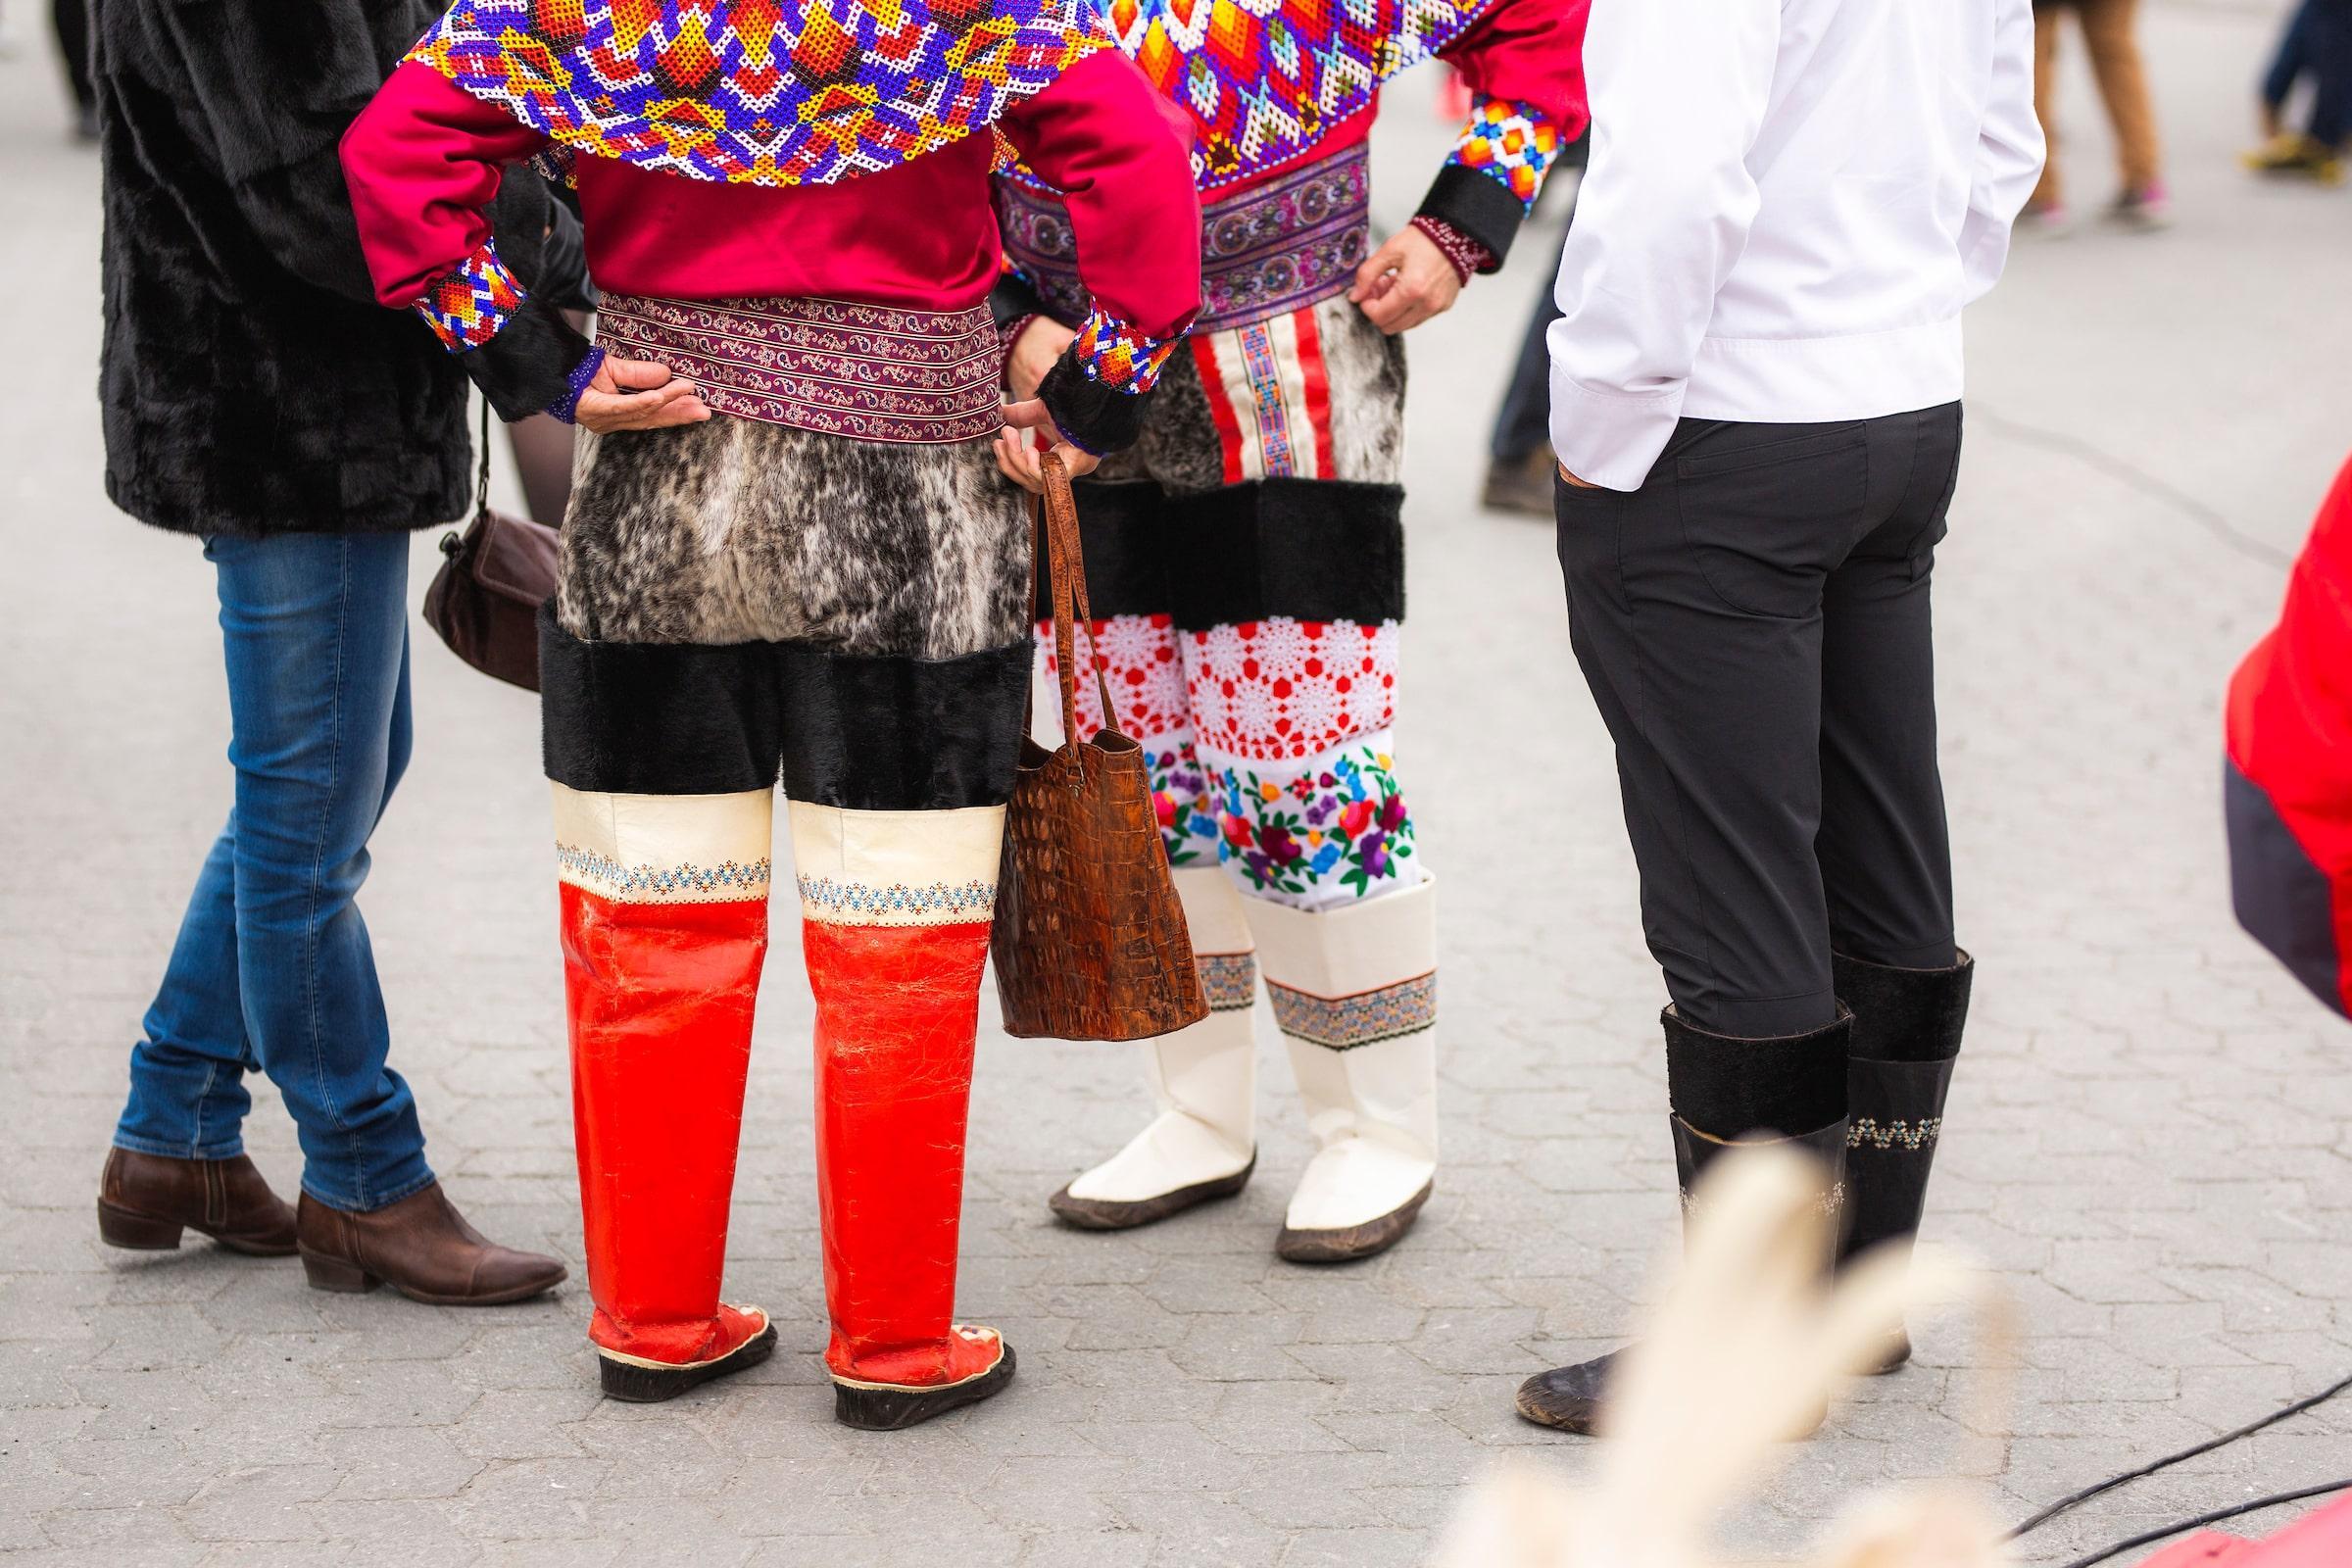 National Clothing. Photo by Aningaaq R Carlsen - Visit Greenland